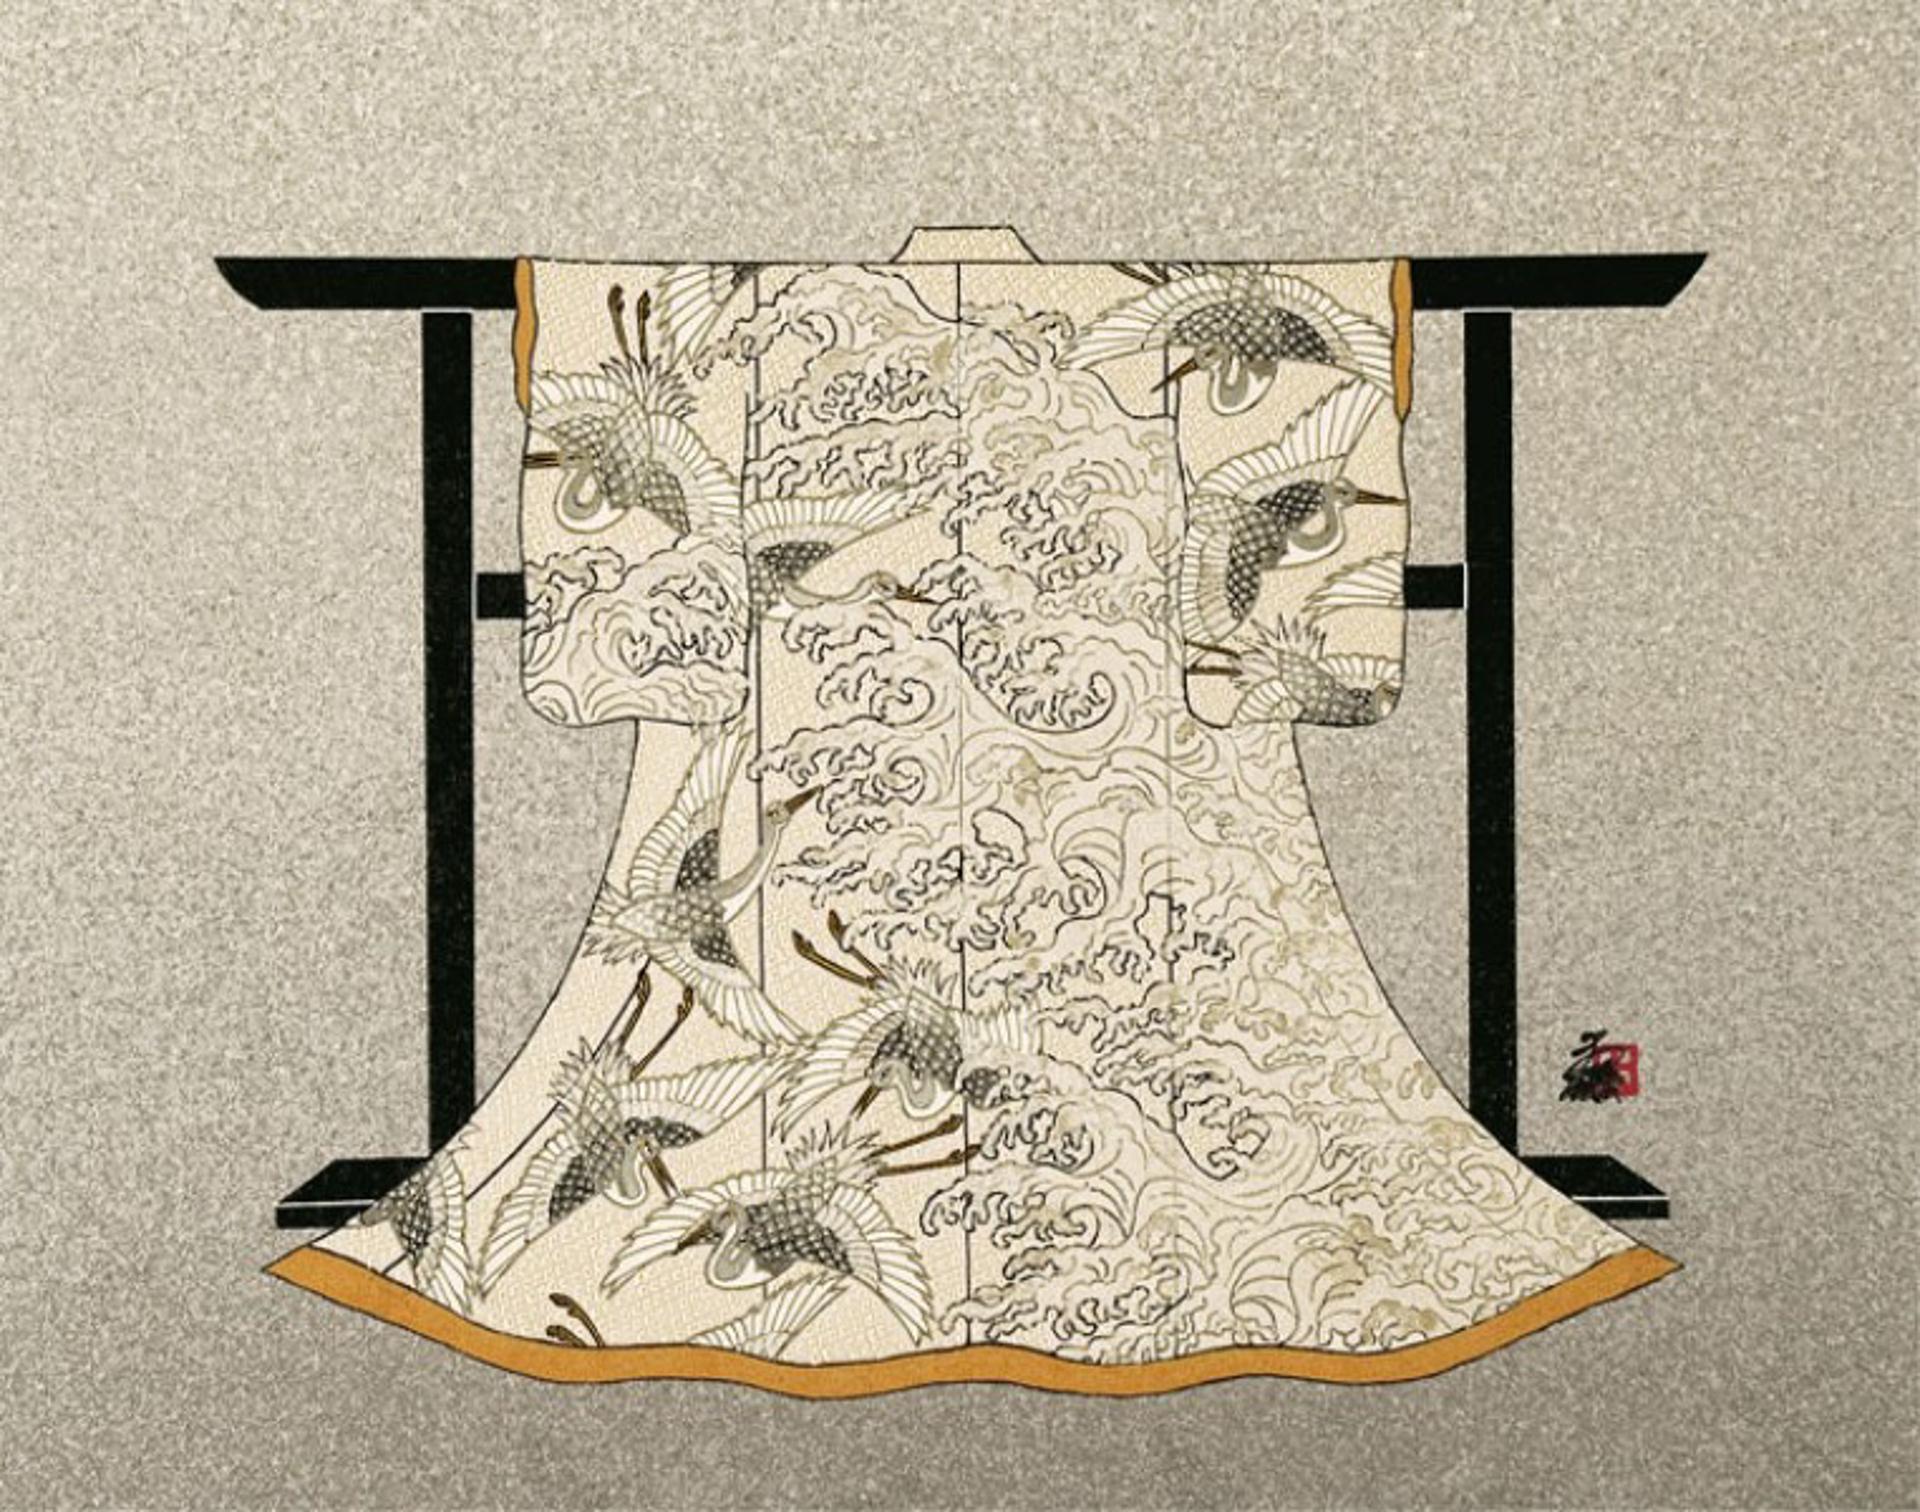 Egrets And Waves (Kimono) by Hisashi Otsuka